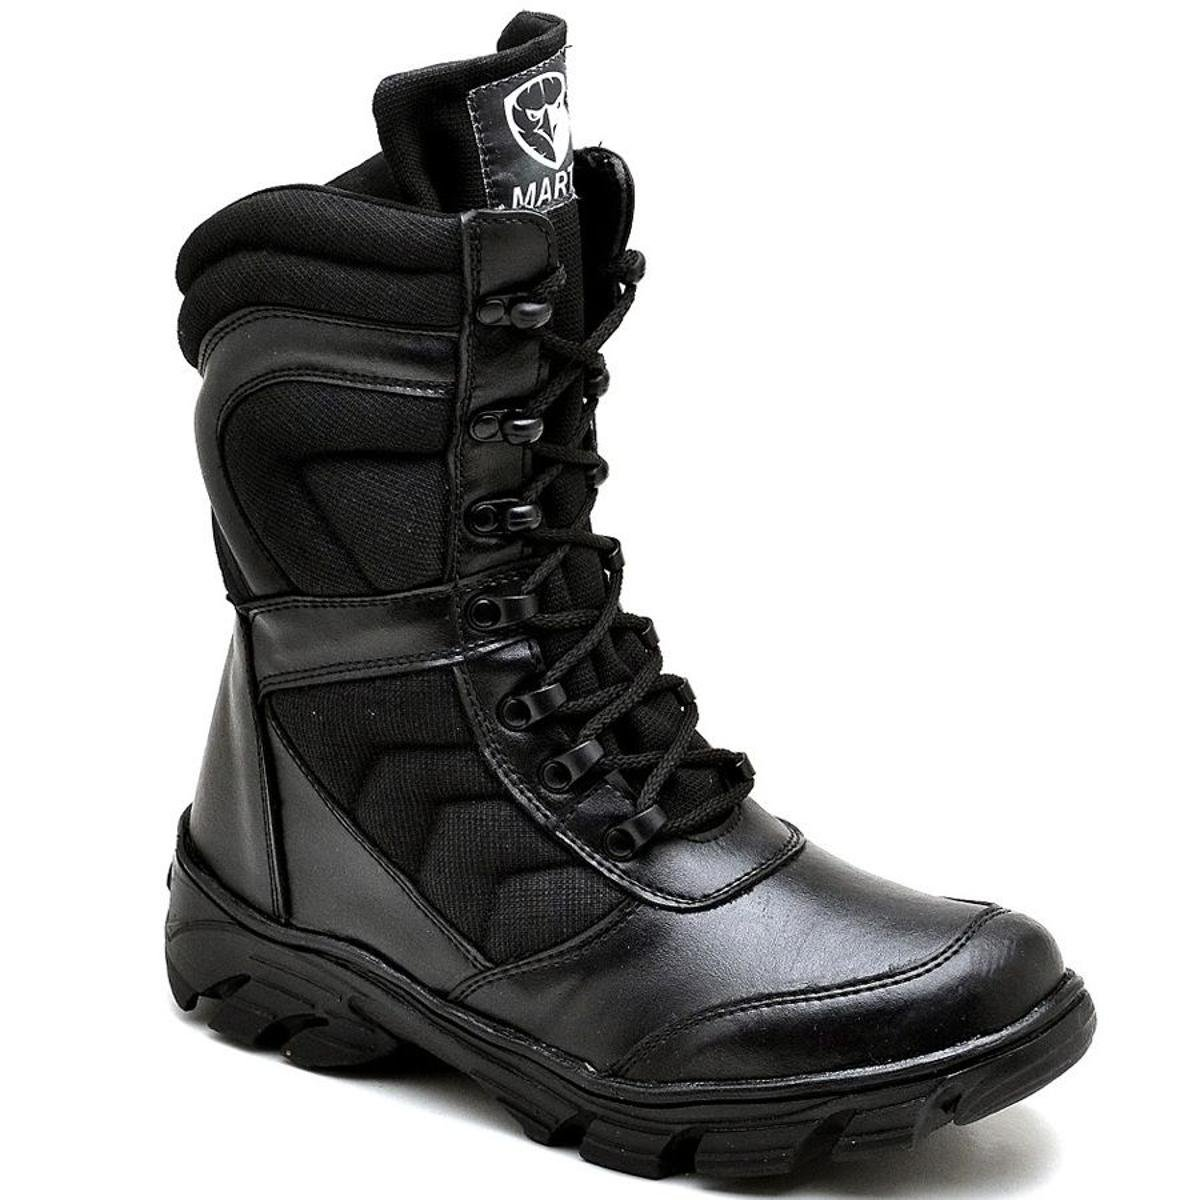 Preto Bota Franca Top Bota Top Militar Shoes w181YSnPx